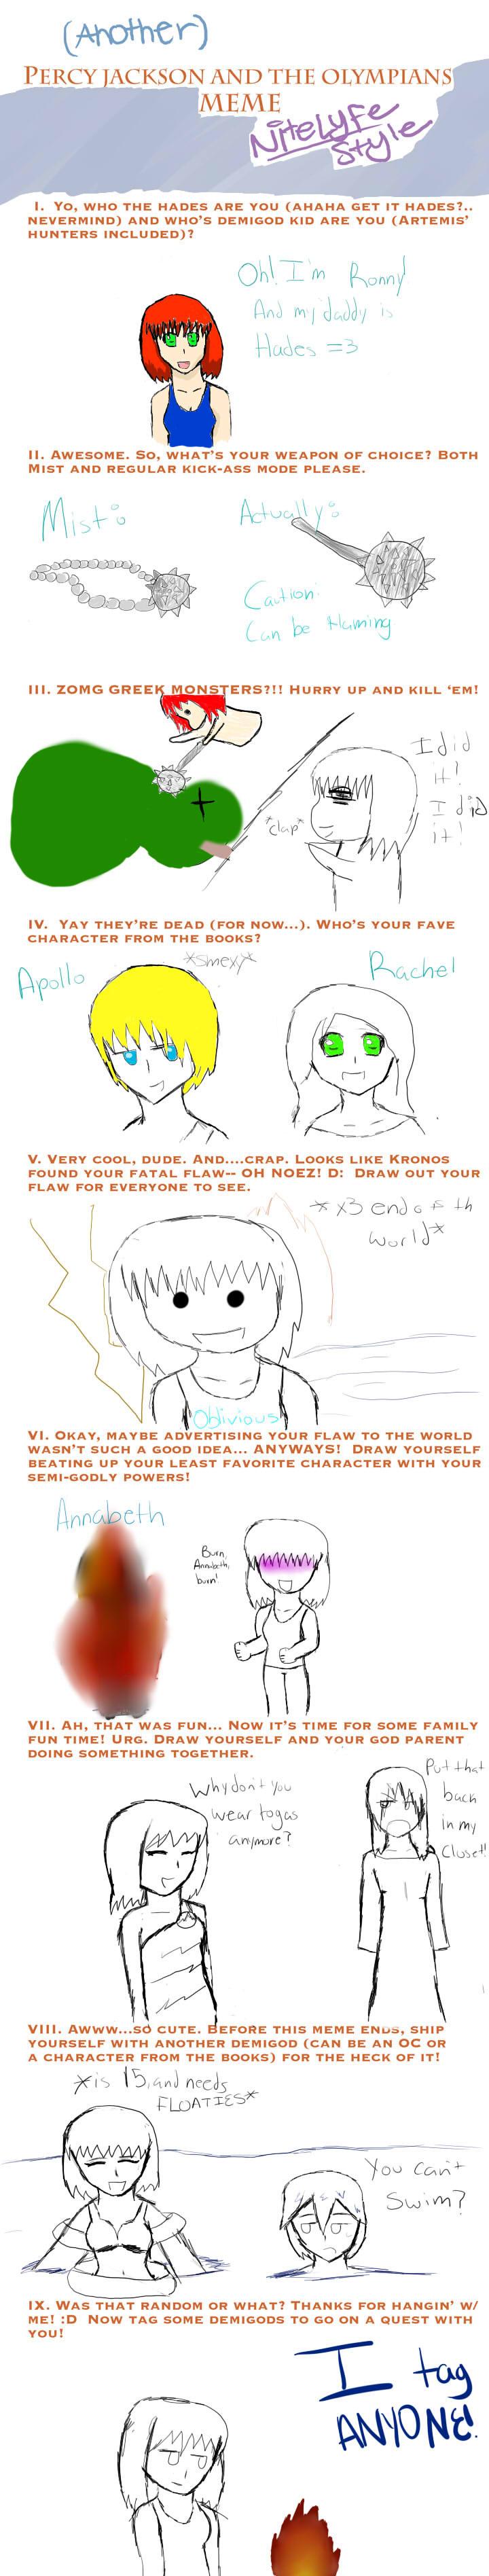 Percy Jackson Meme by Ashanime777 on DeviantArt